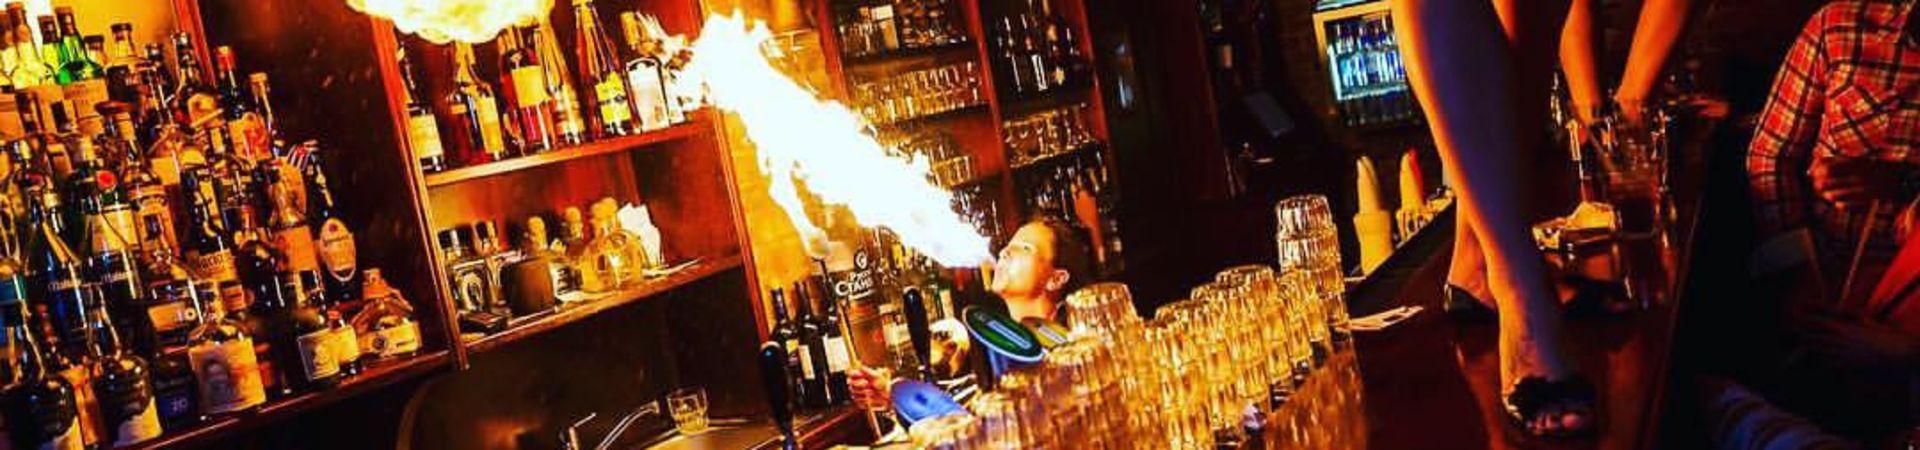 Aloha Music Club & Cocktail Bar